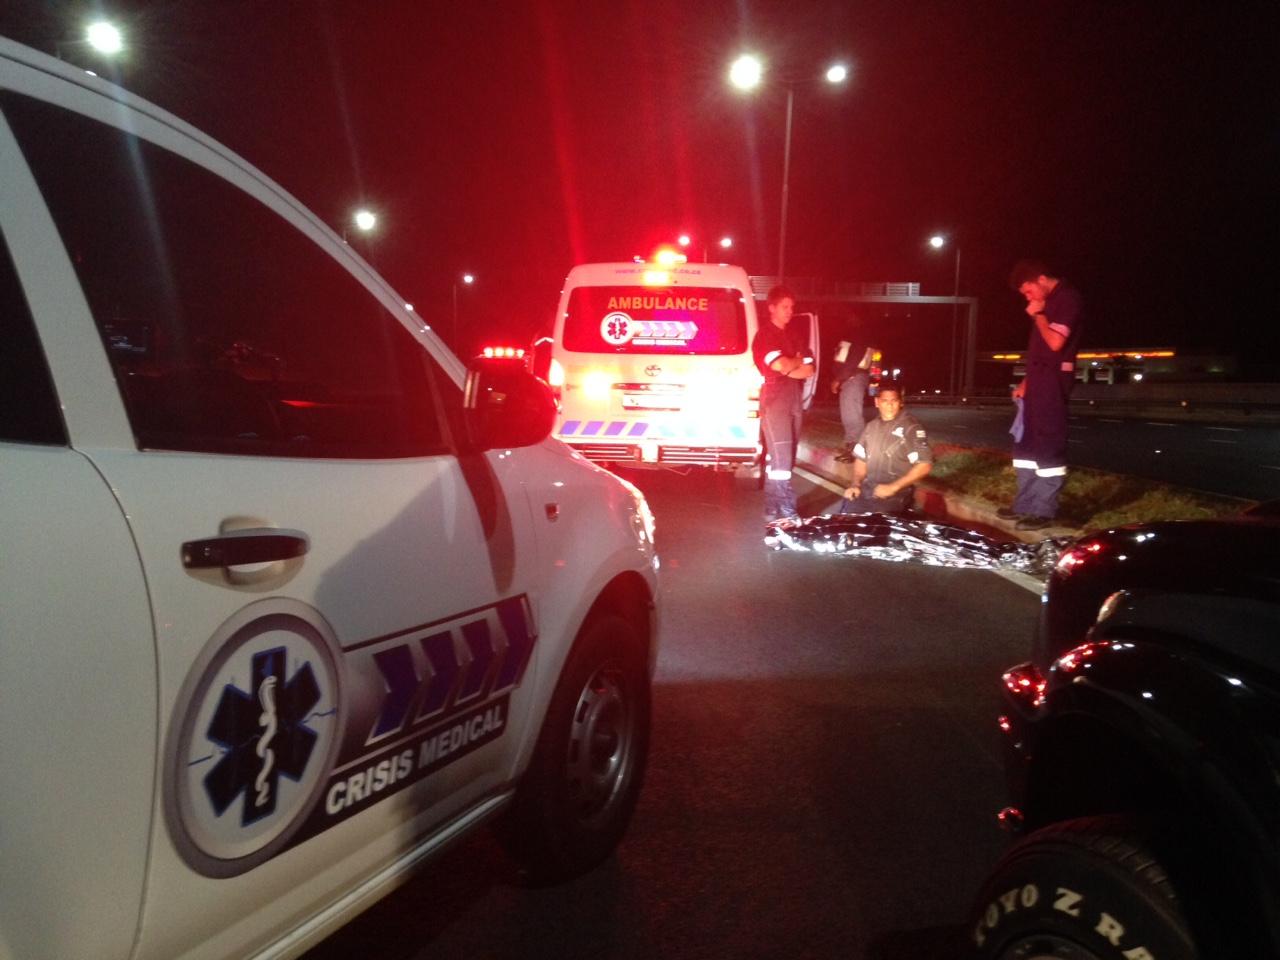 Pedestrian killed on M19